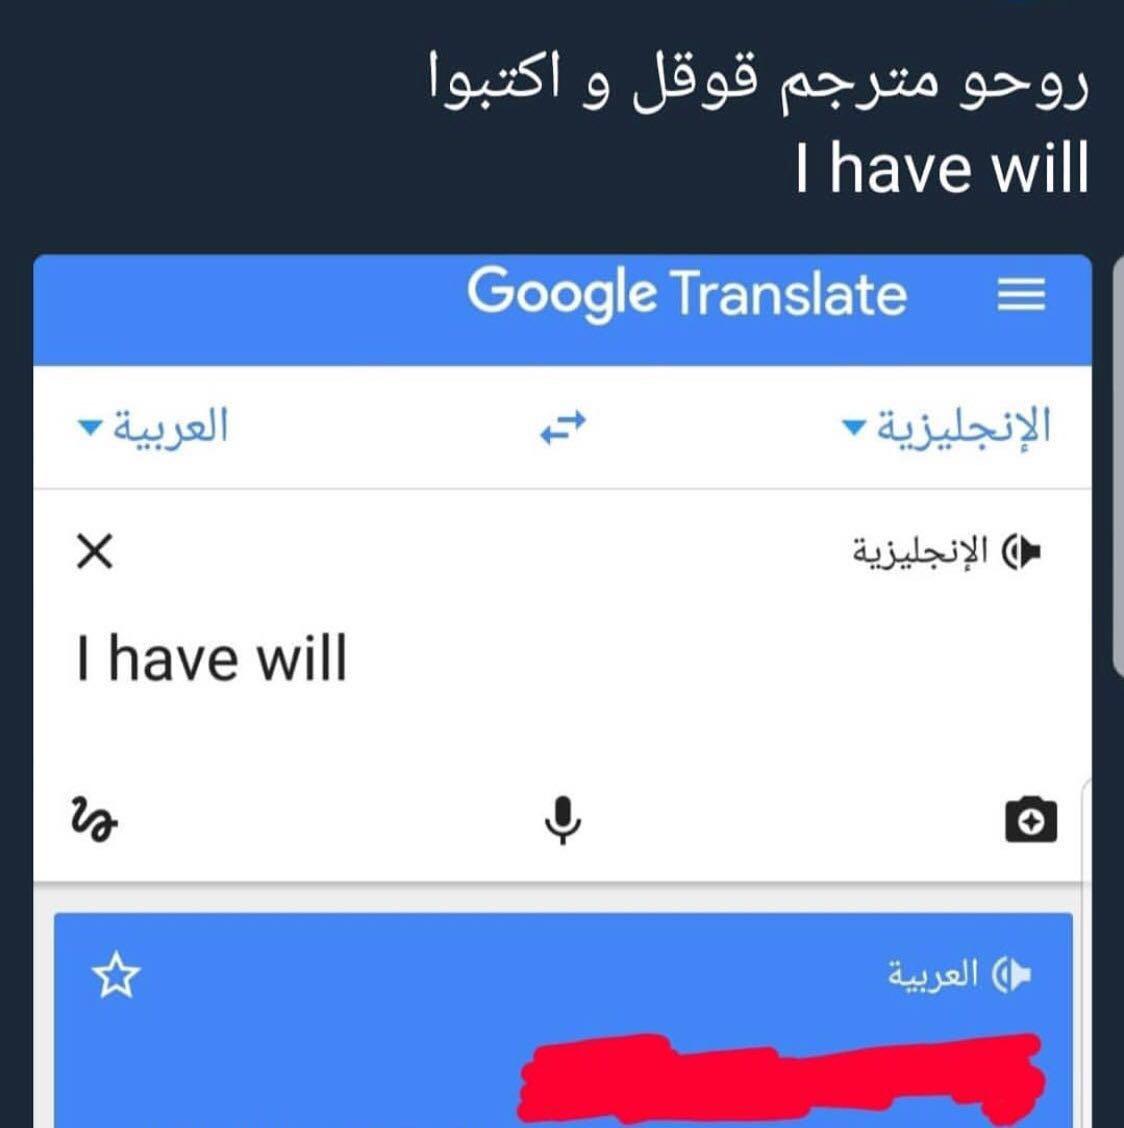 Tv قناة رقمي على تويتر ق م يكتابة I Have Will على ترجمة جوجل